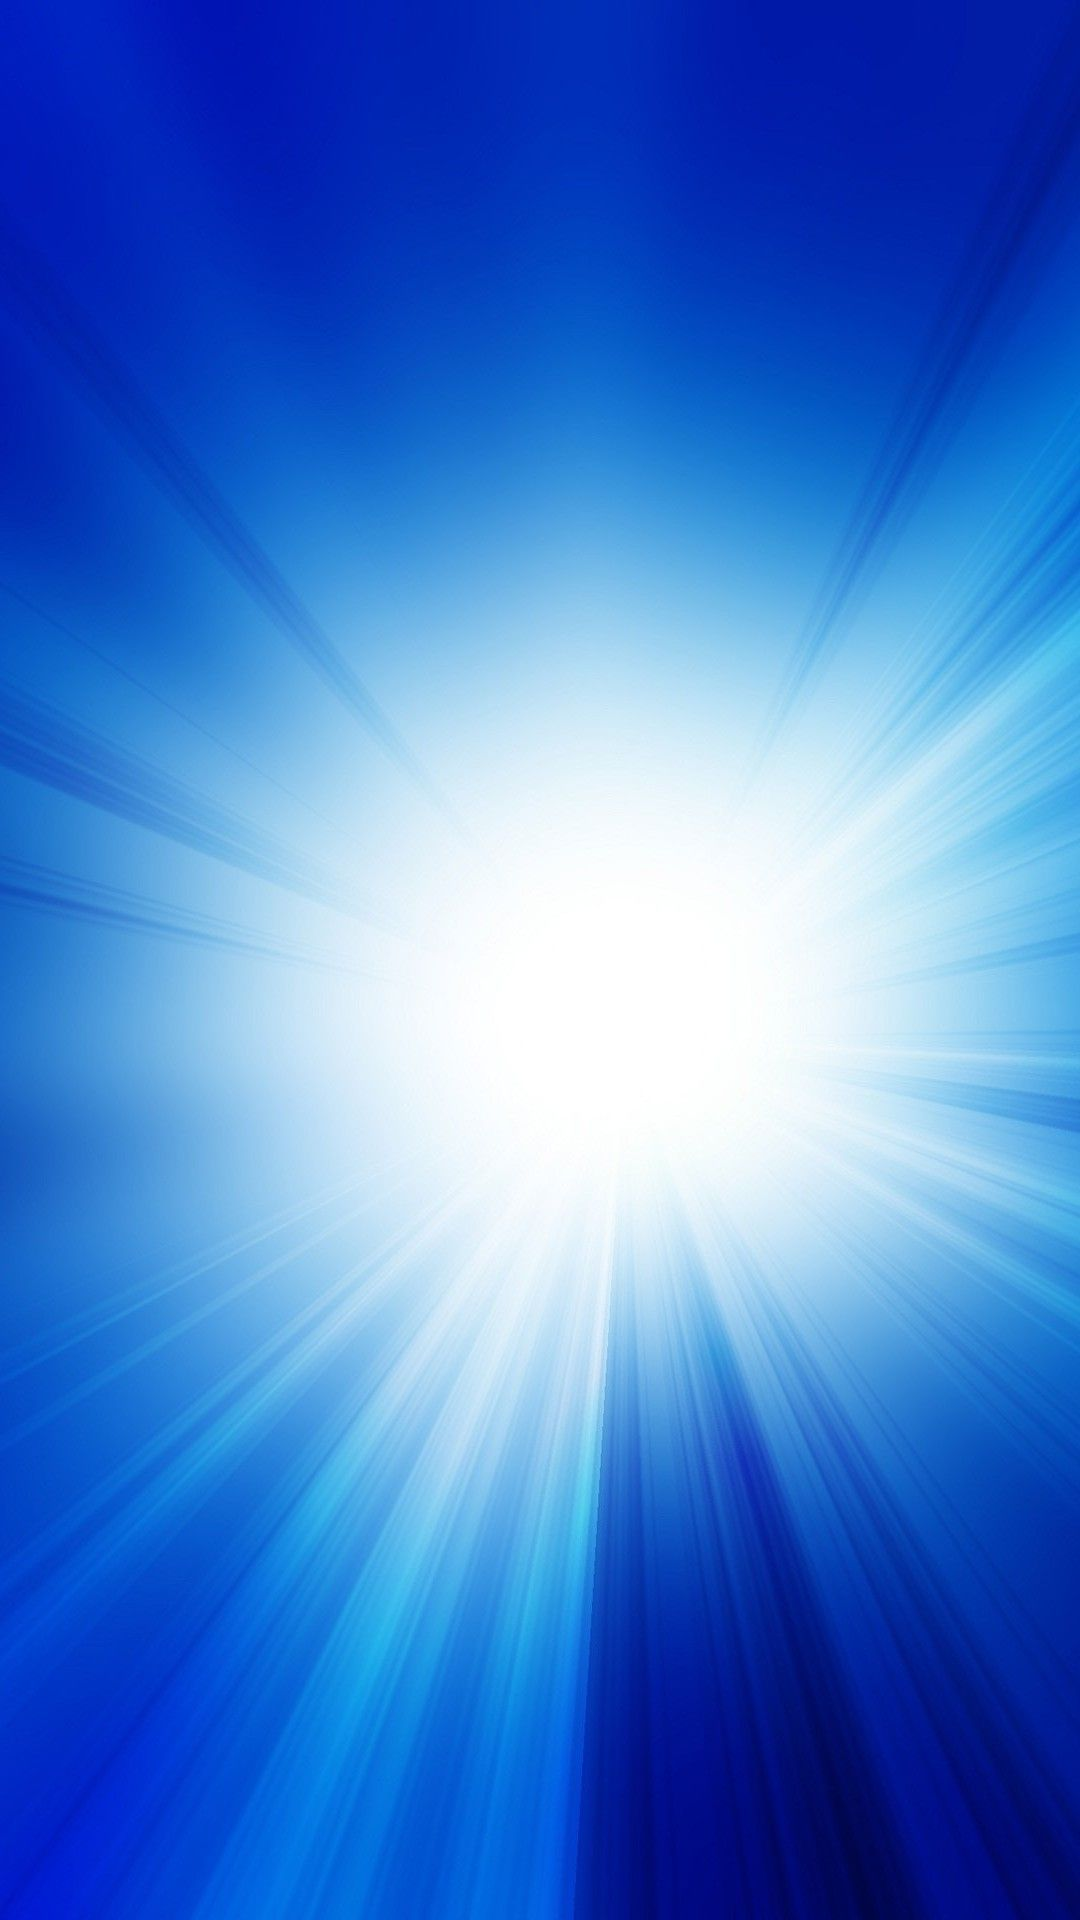 Light Blue Wallpaper For Iphone Beautiful Blues Iphone Wallpaper